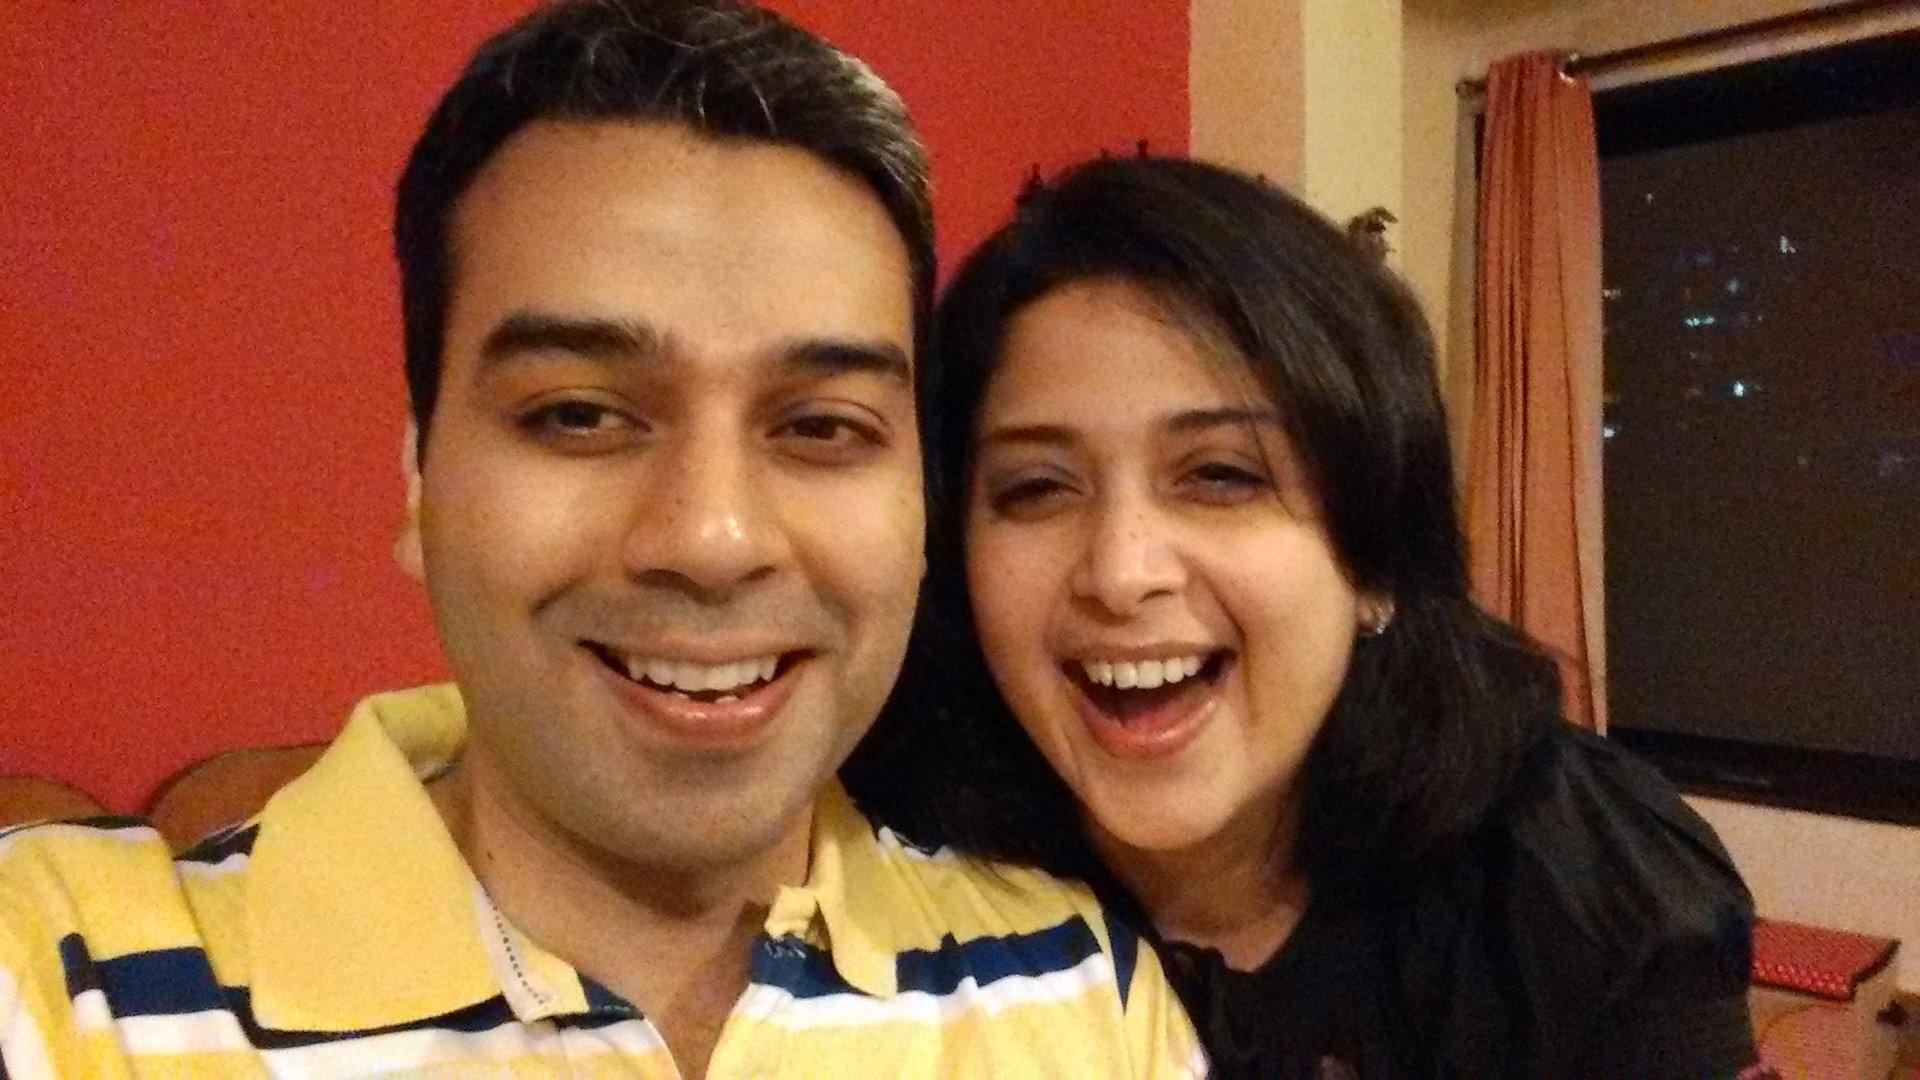 Mrigaen Kapadia Nupur Kapadia Mobifolio creative couple entrepreneurs